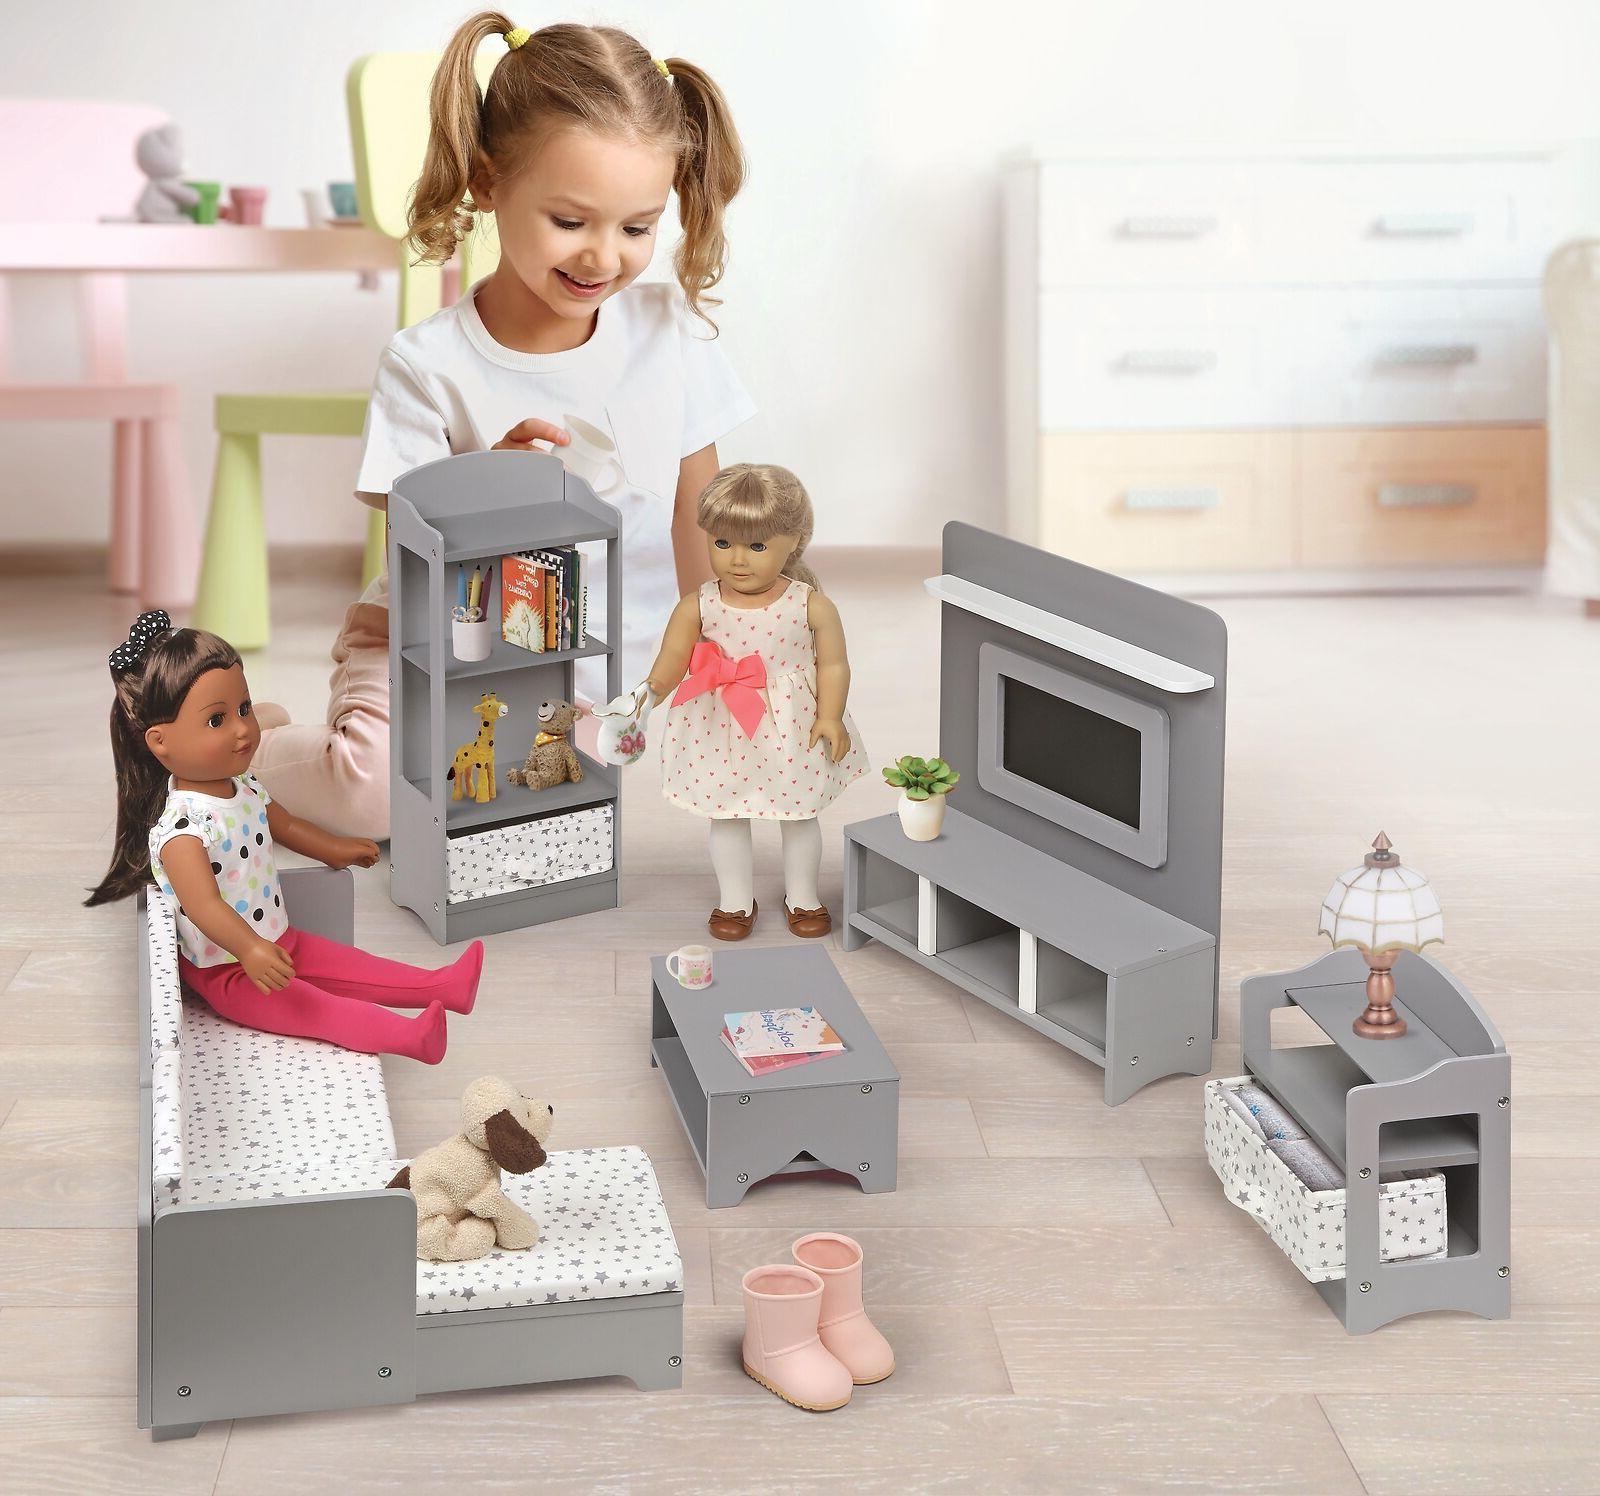 "Doll Set Fits 18"" Dolls Girls Toys Kids"